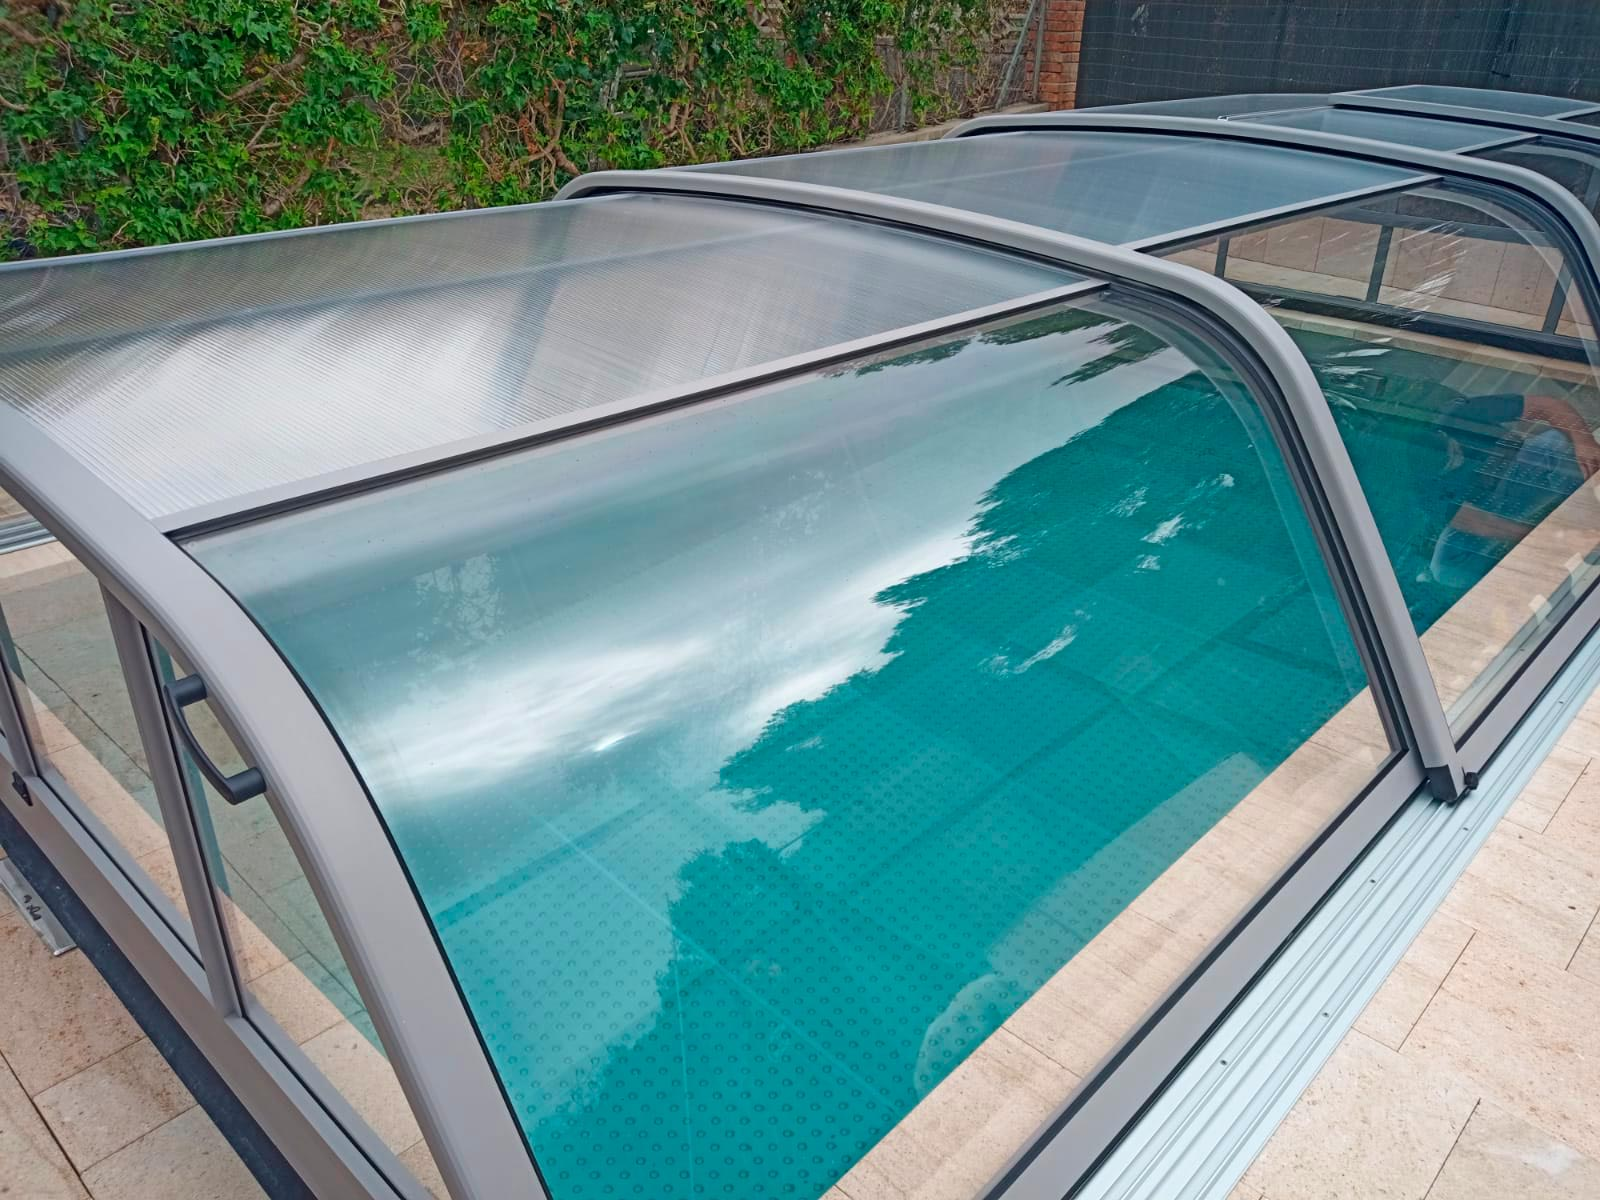 piscina-de-acero-inoxidable-cubierta-3530